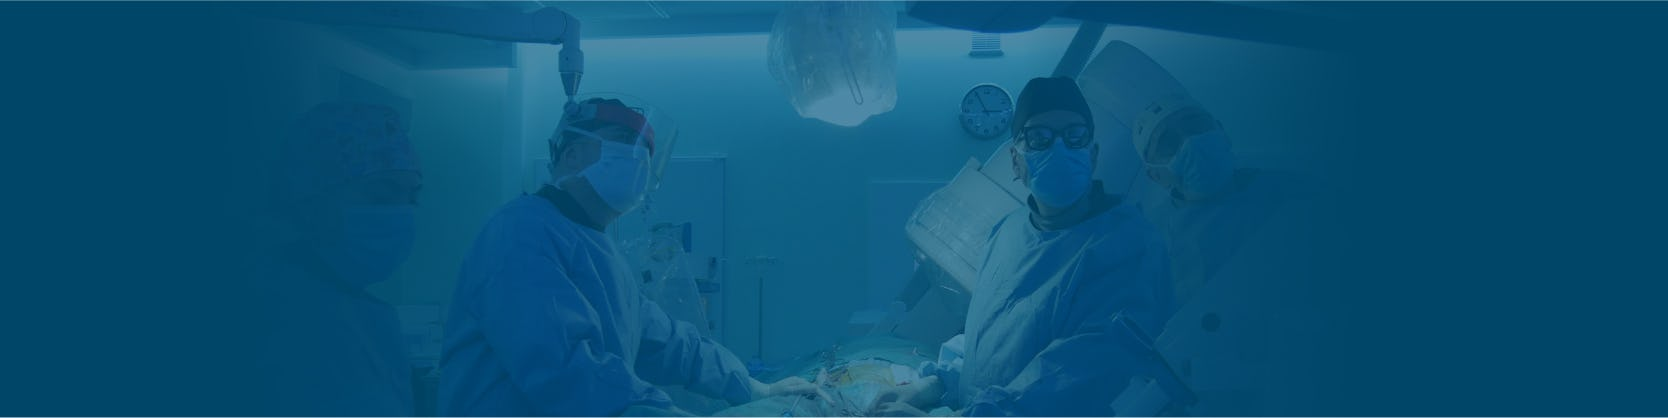 Implantare Filtru Vena Cava | Centrele Ares | Radiologie Interventionala